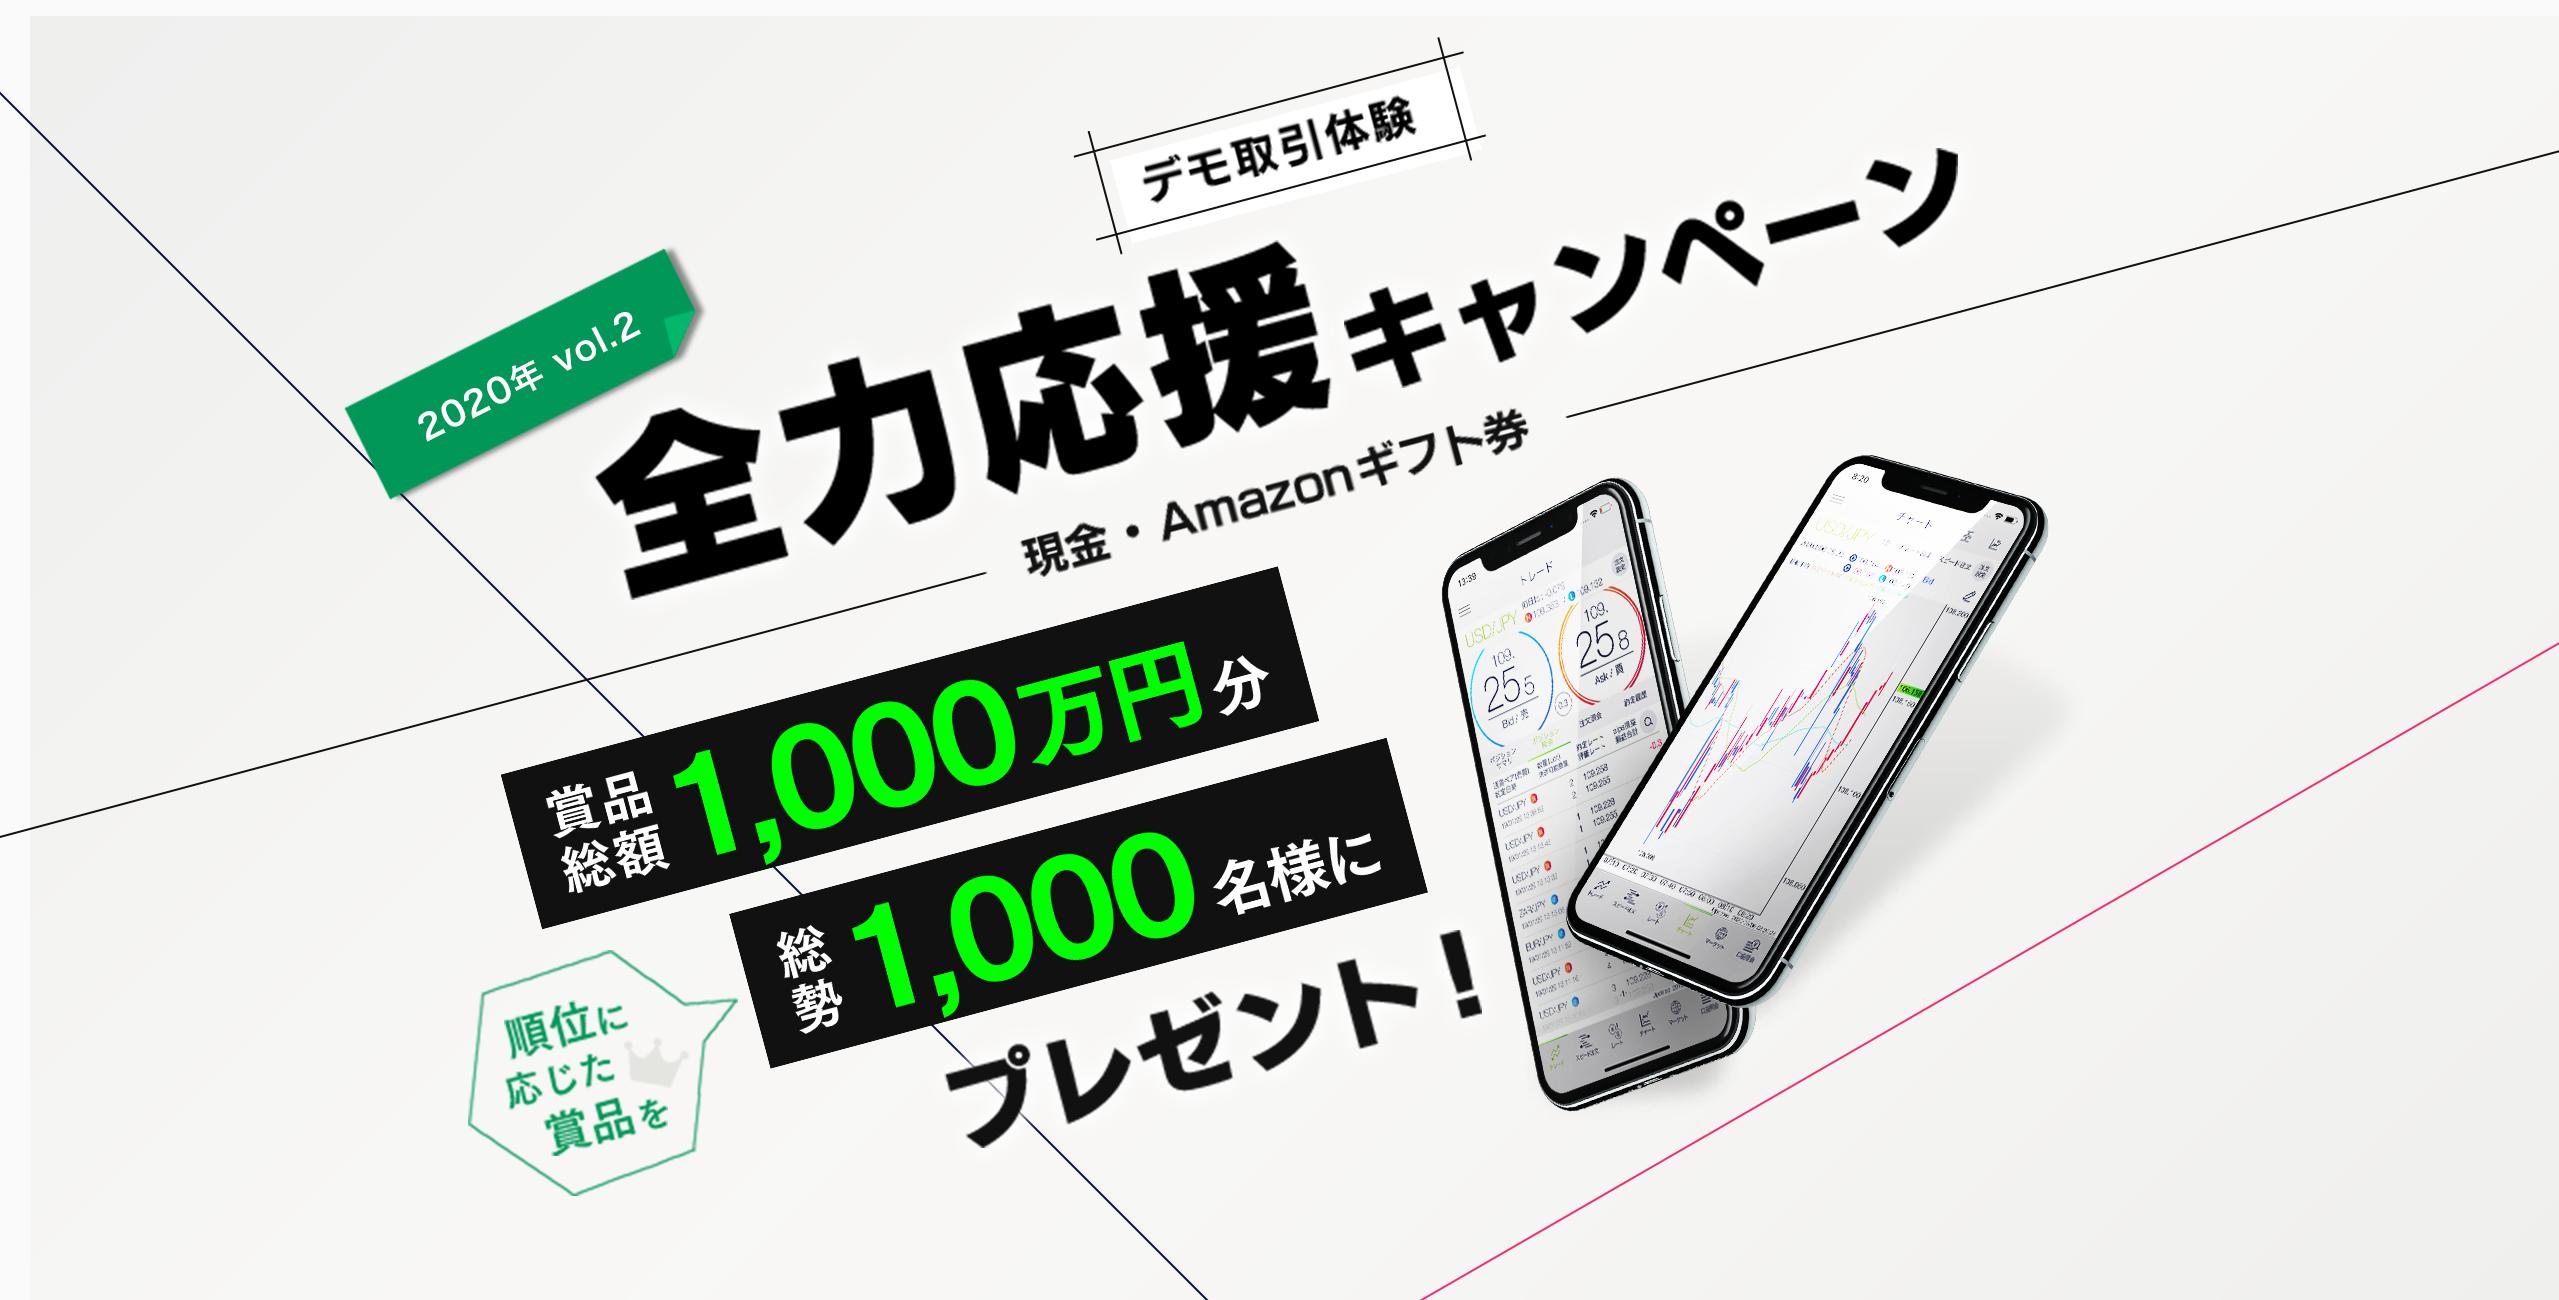 DMM FXでデモ取引で合計1000万円分のアマゾンギフト券が1000名に当たる。~6/9 6時。